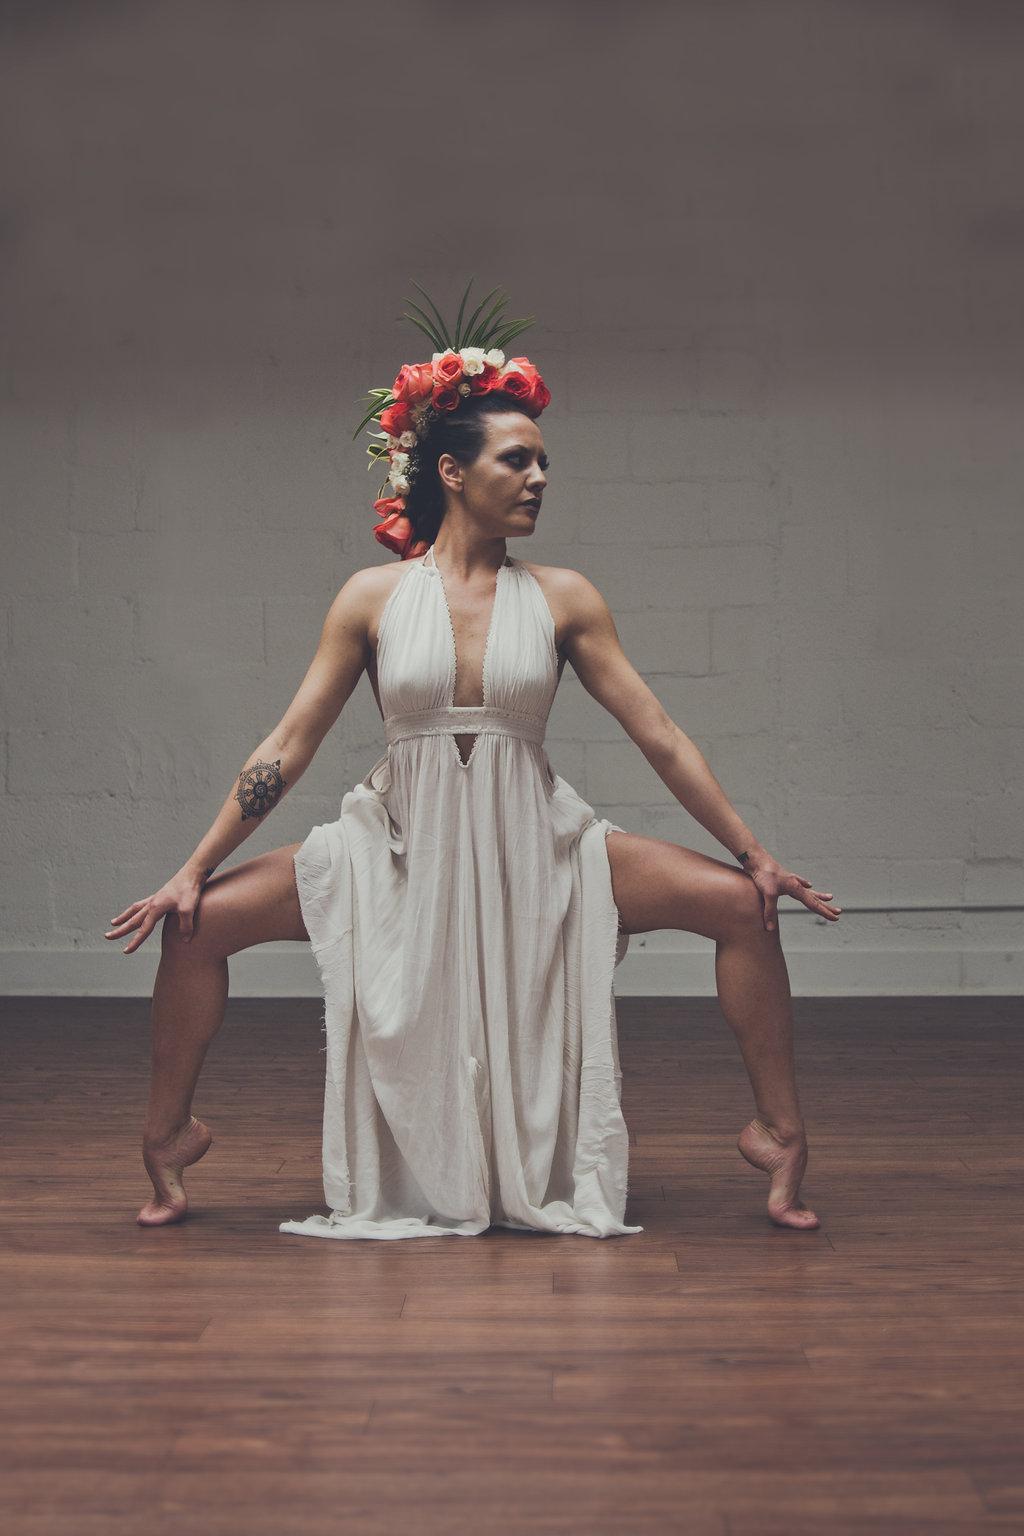 Lisa Rundall Wedding Photography Colorado model doing leg-spread pose